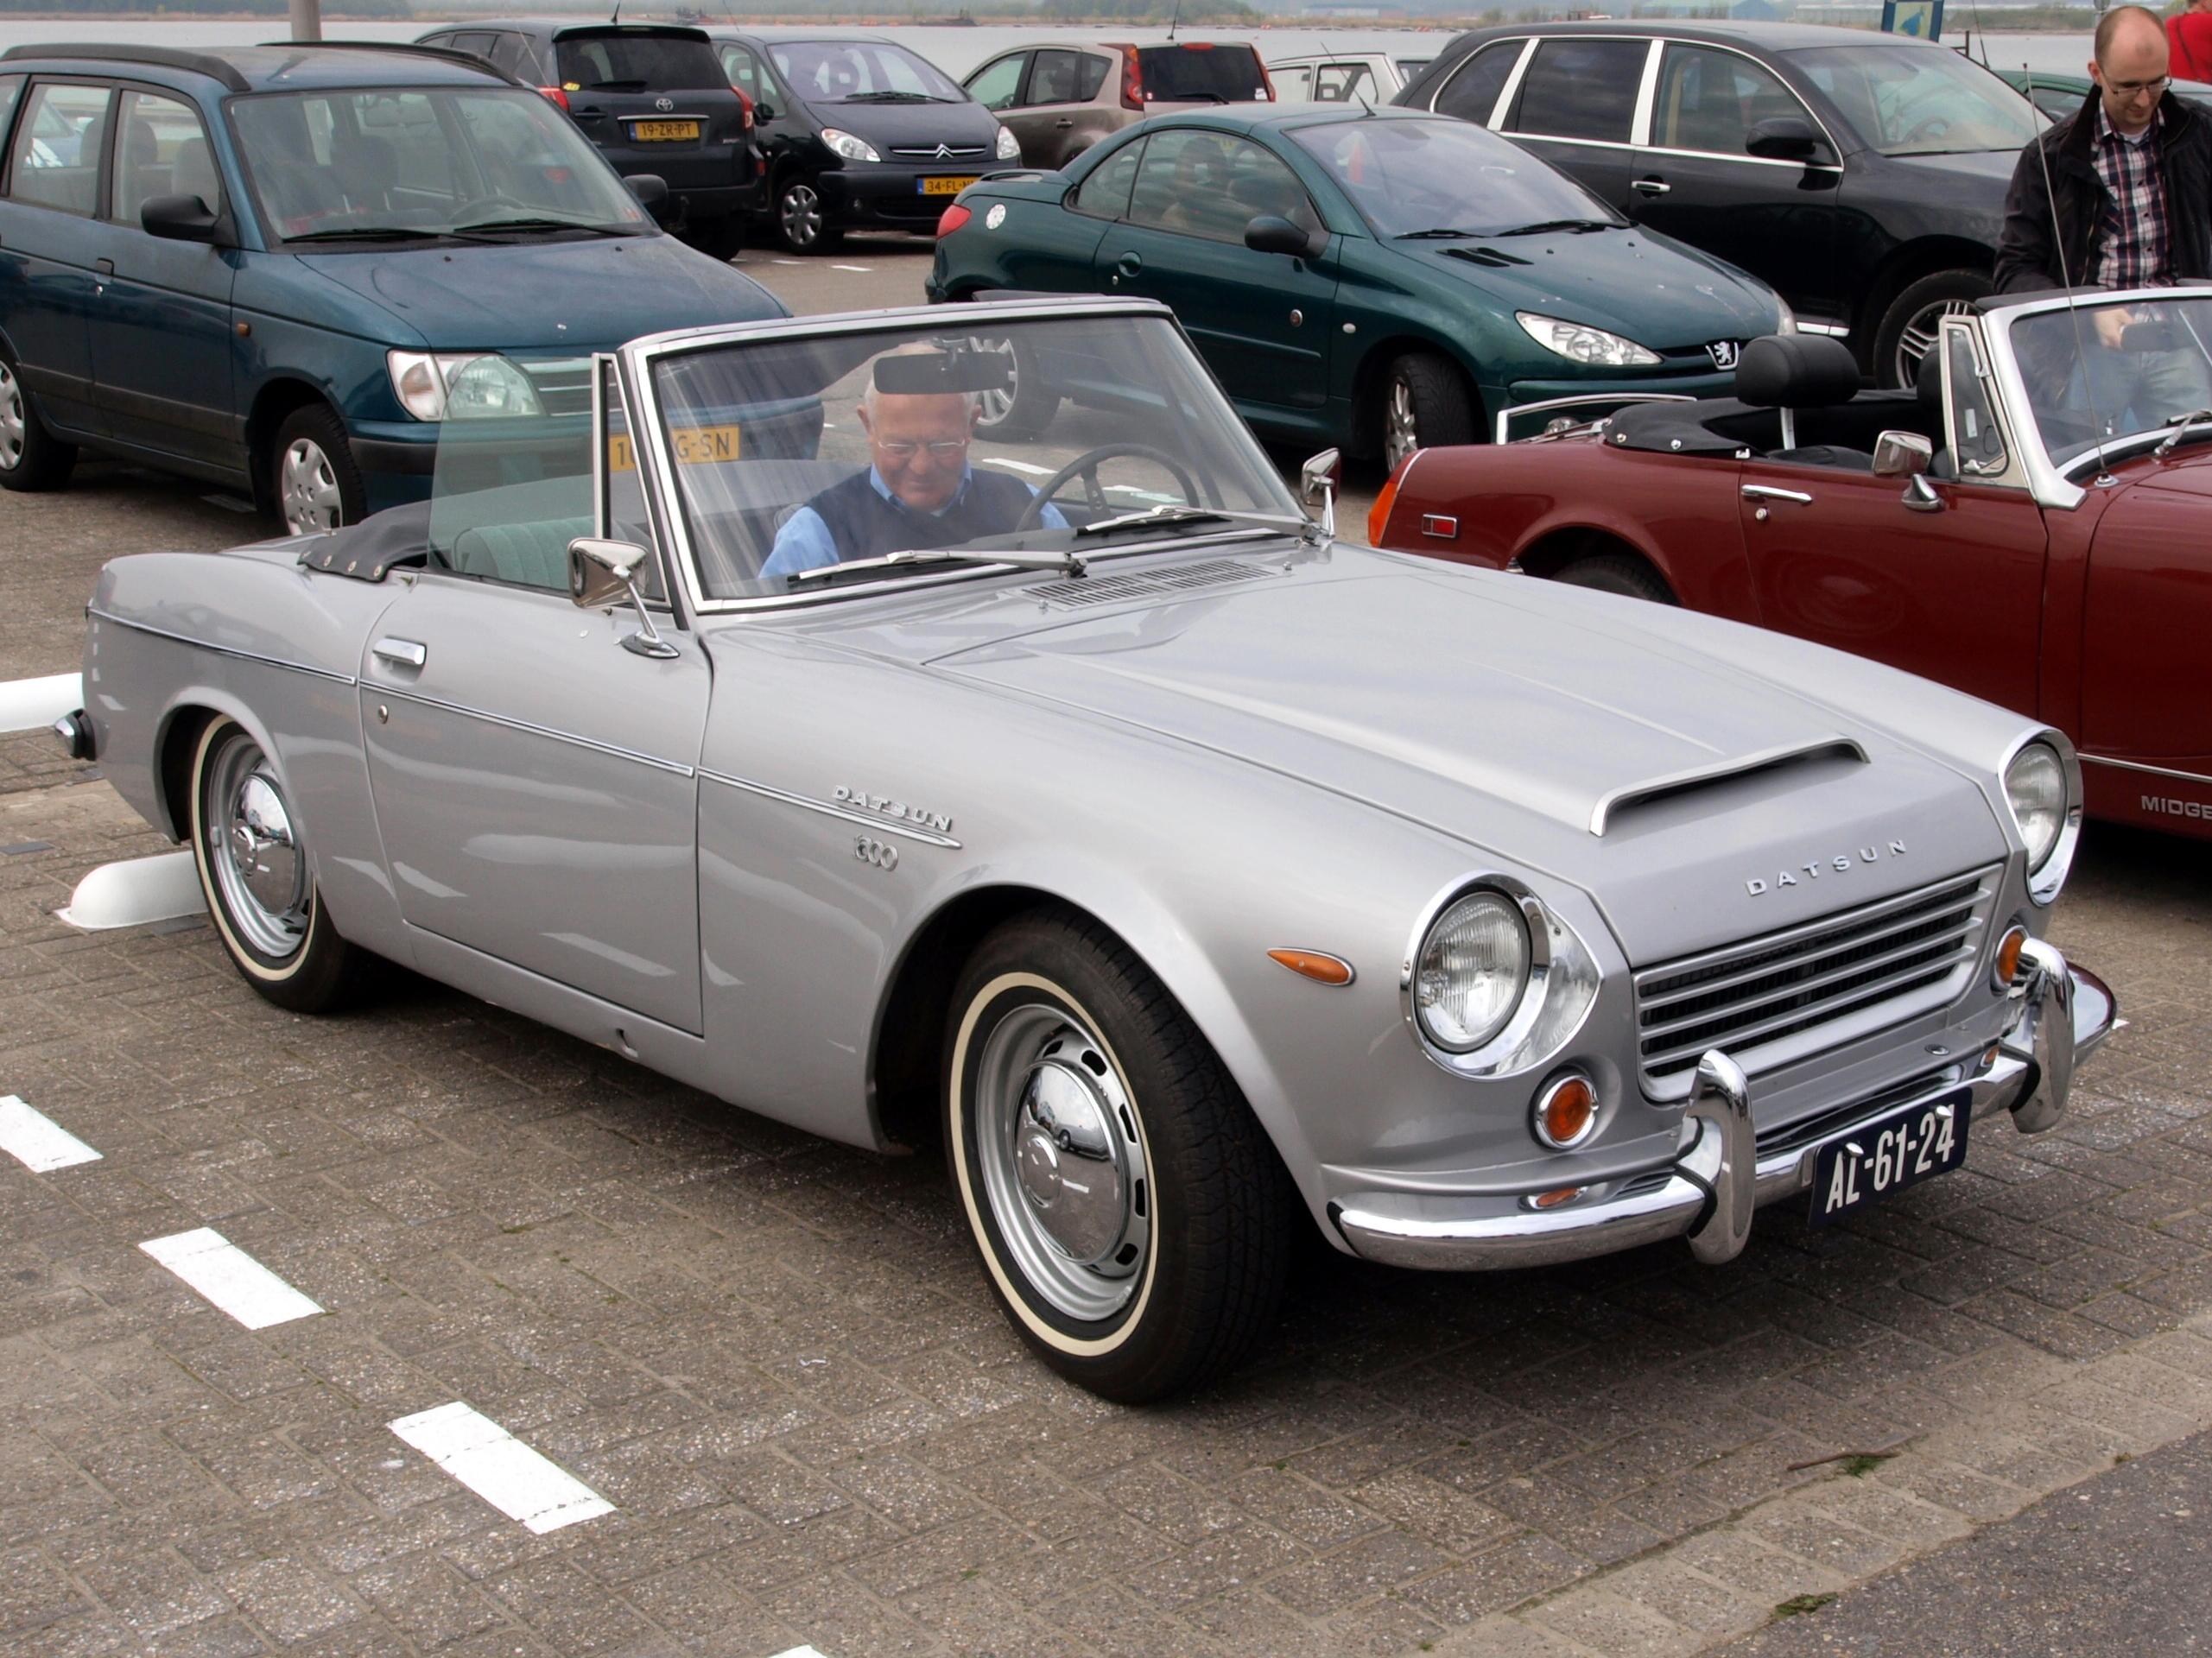 File:Datsun 1600 Fairlady (1969), Dutch licence ...